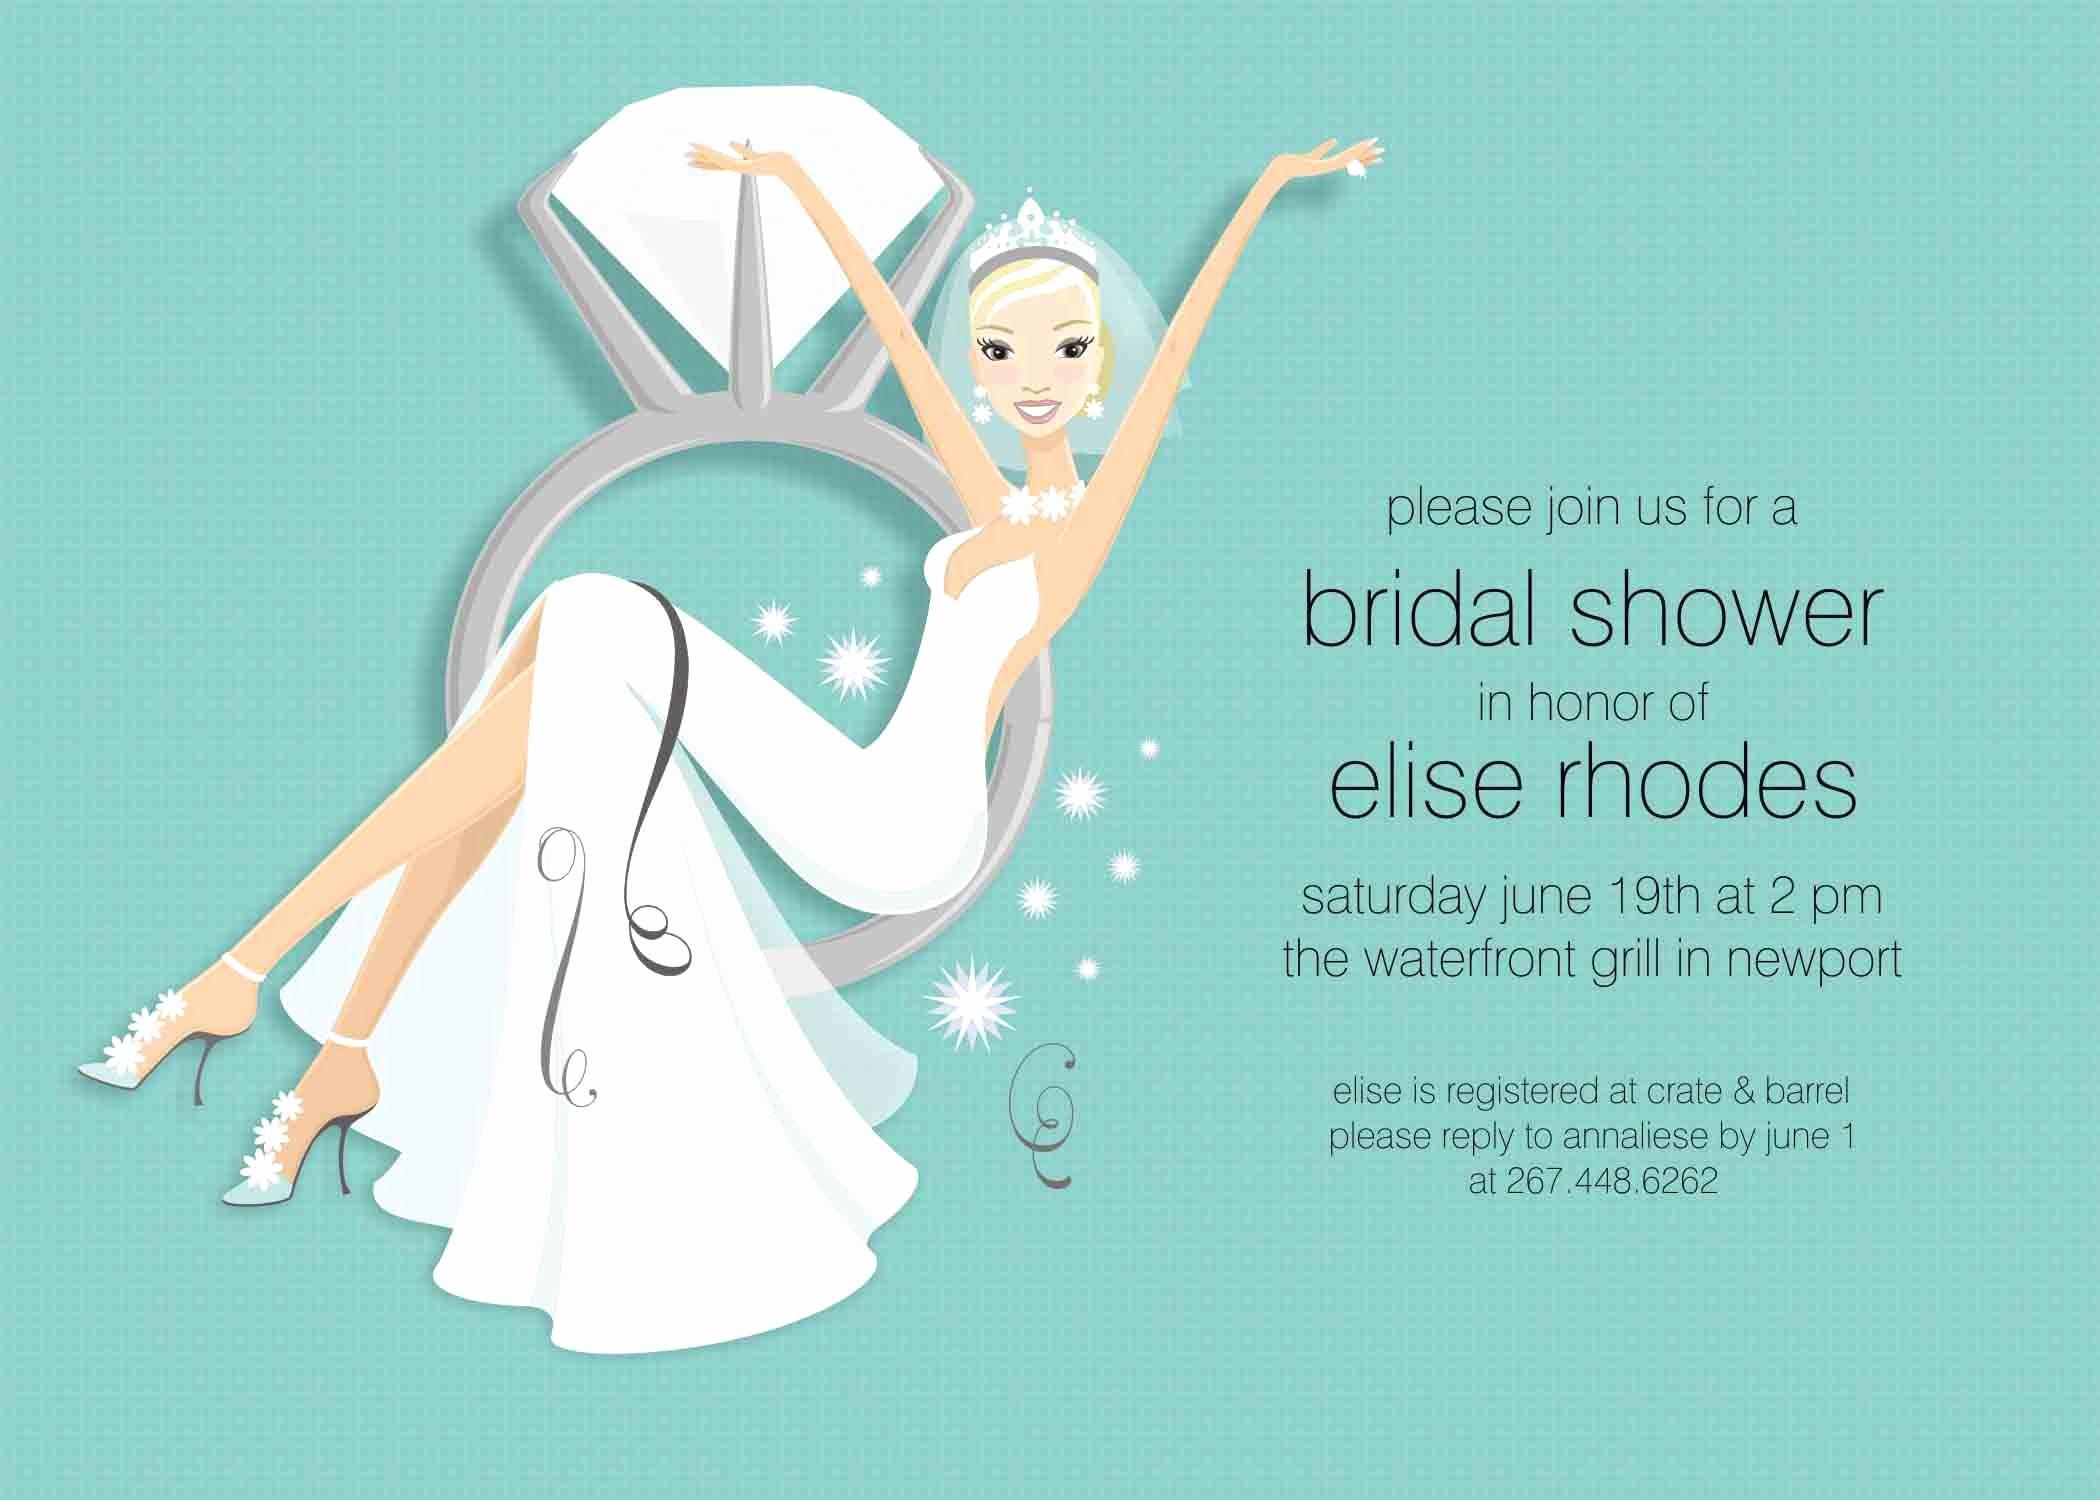 Bridal Shower Invite Template Elegant Baptism Invitation Christening Invitation Card Maker